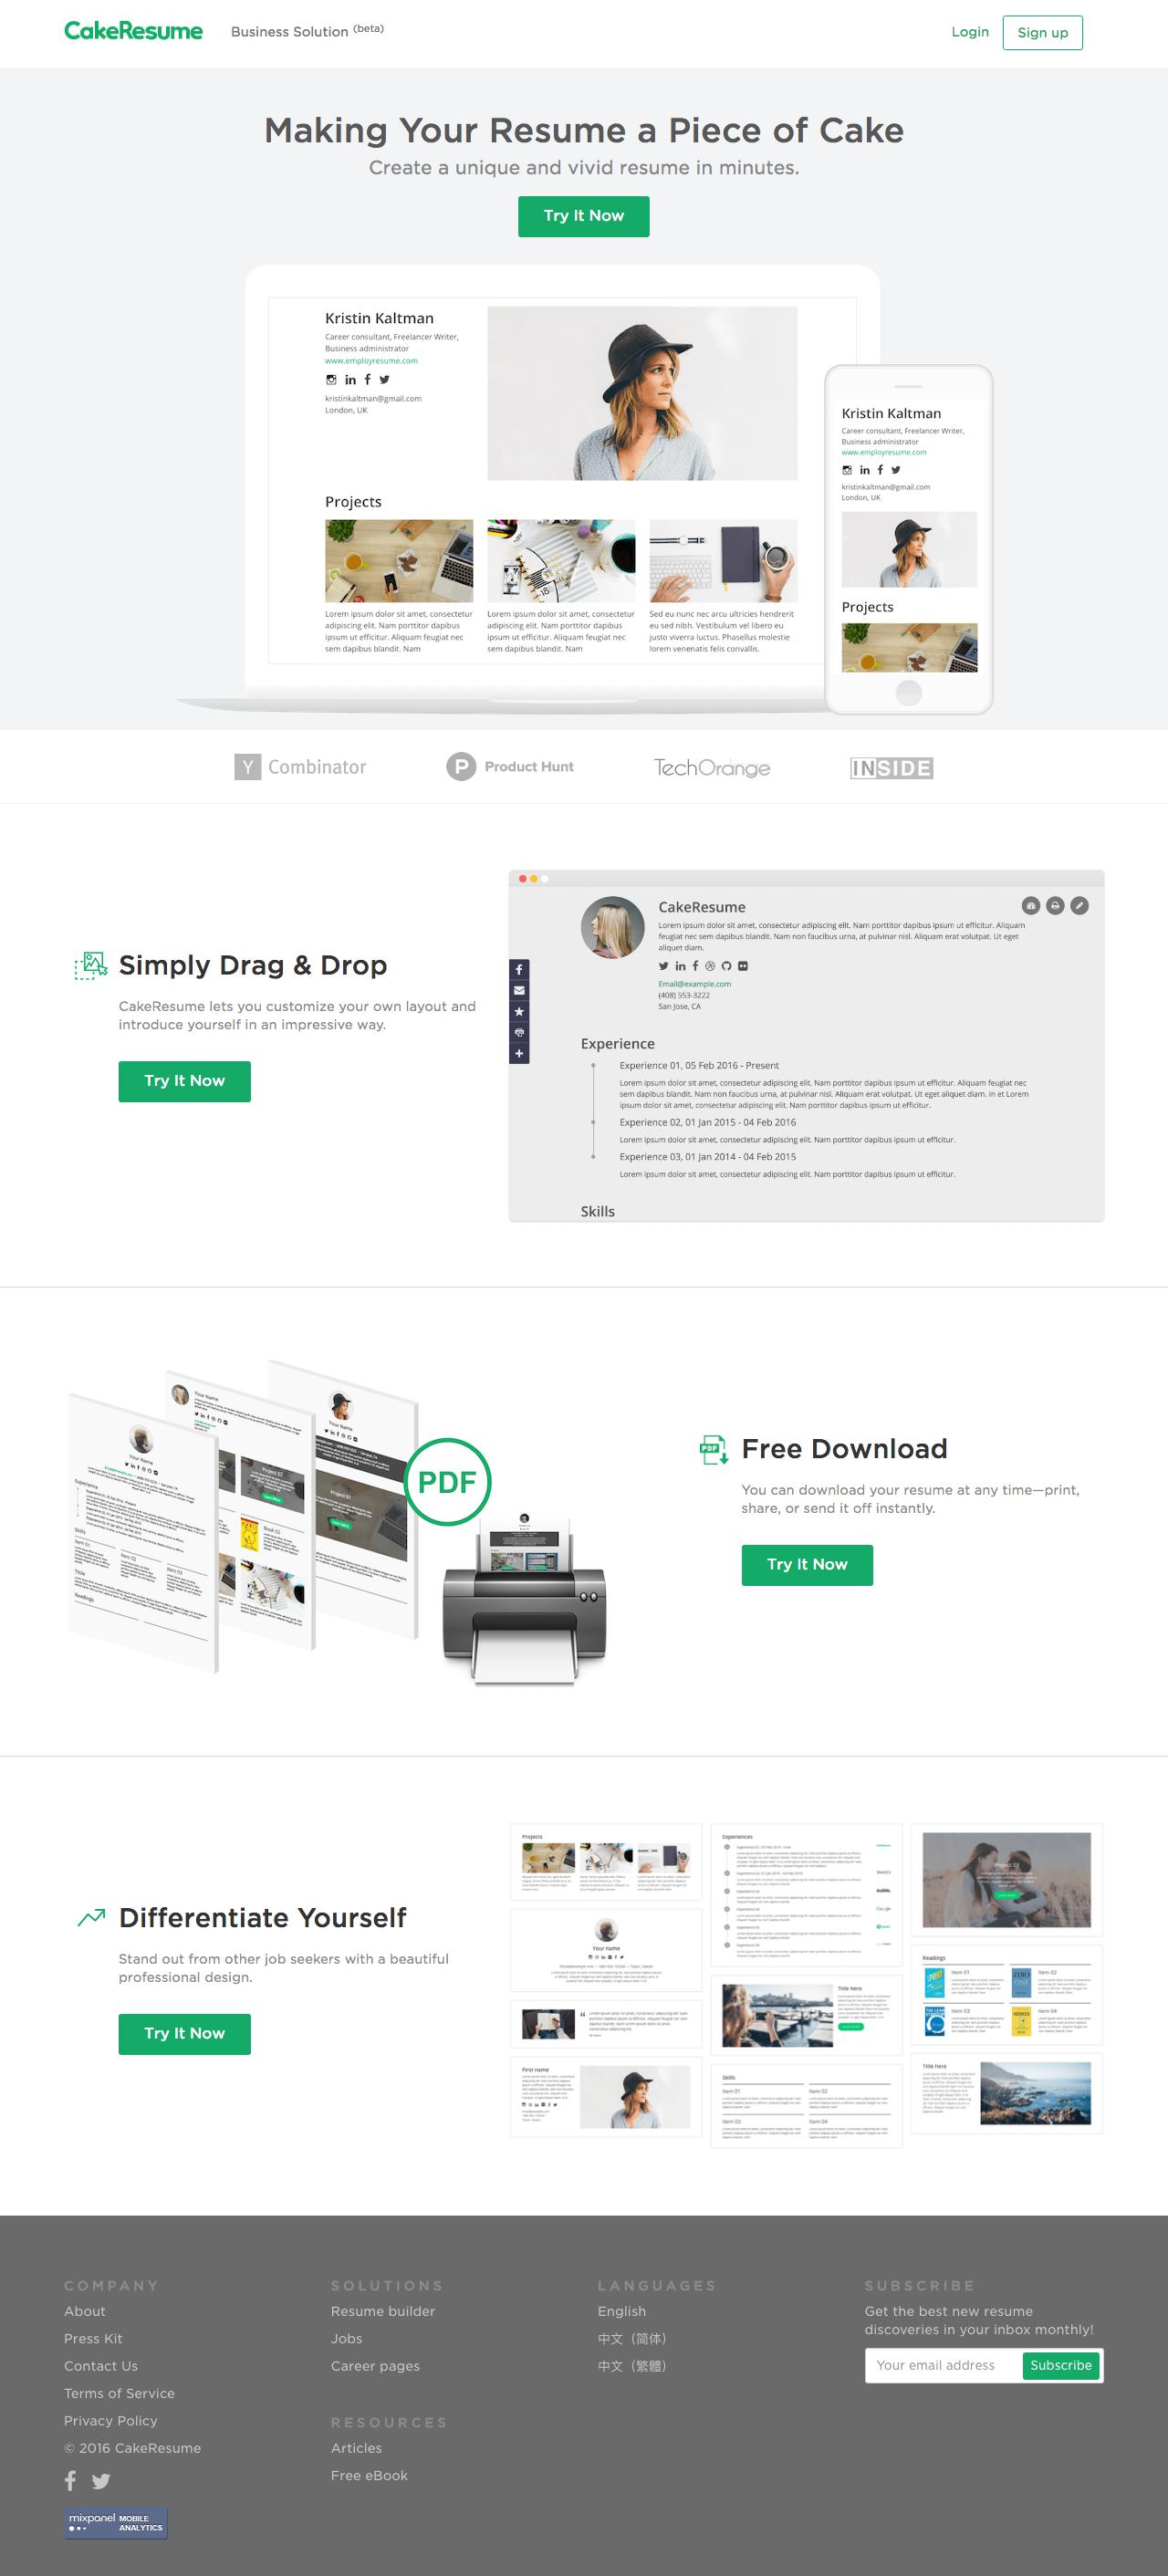 Pin By Aleksandra Savic On Web Online Resume Builder Free Online Resume Builder Resume Builder